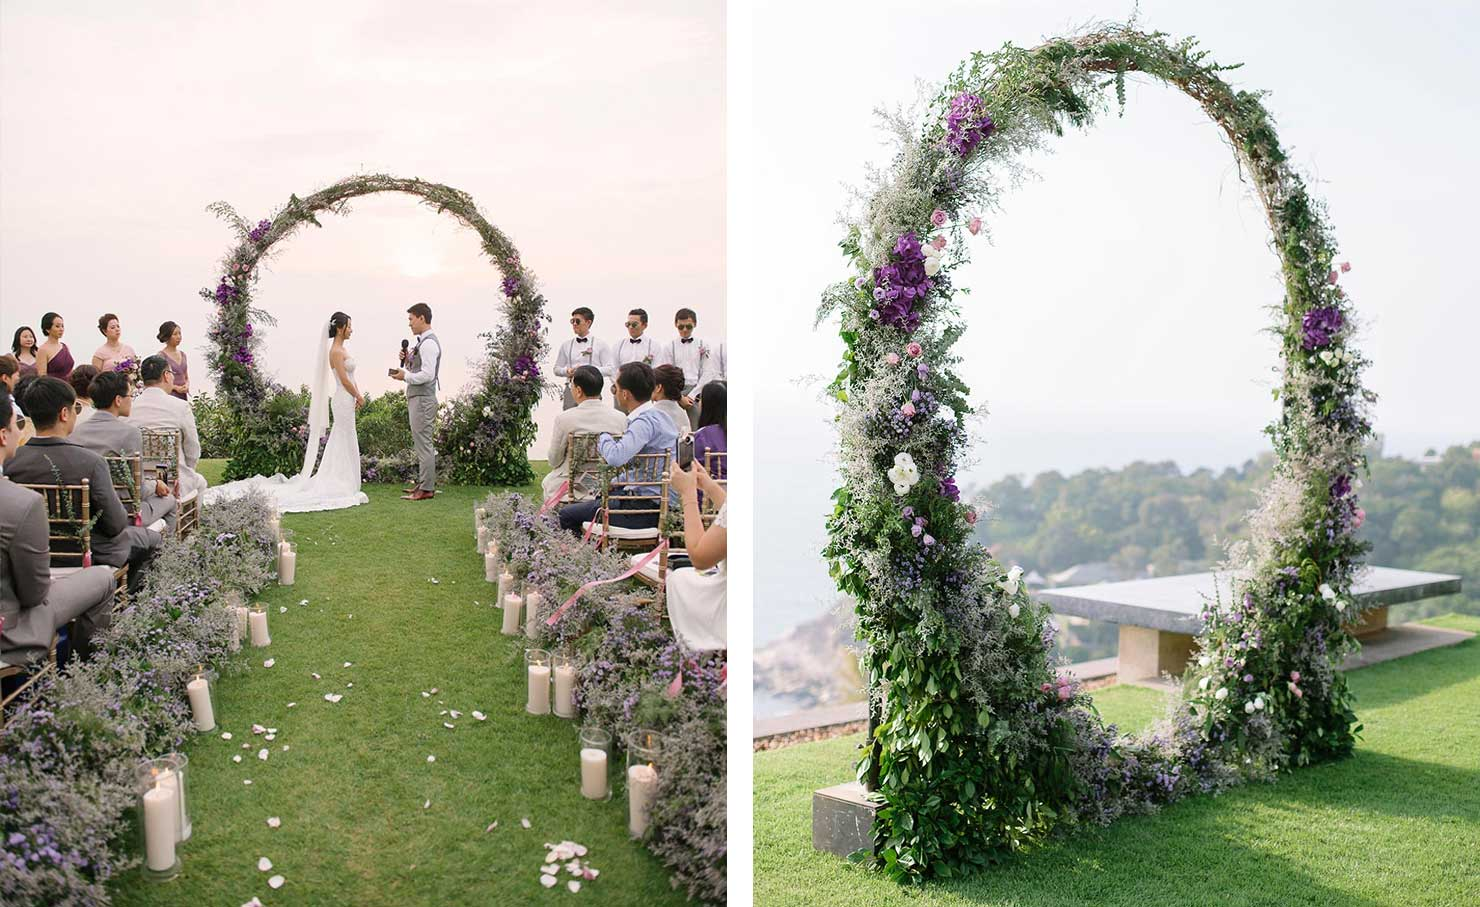 42 Unique Ways To Personalize Your Wedding Ceremony